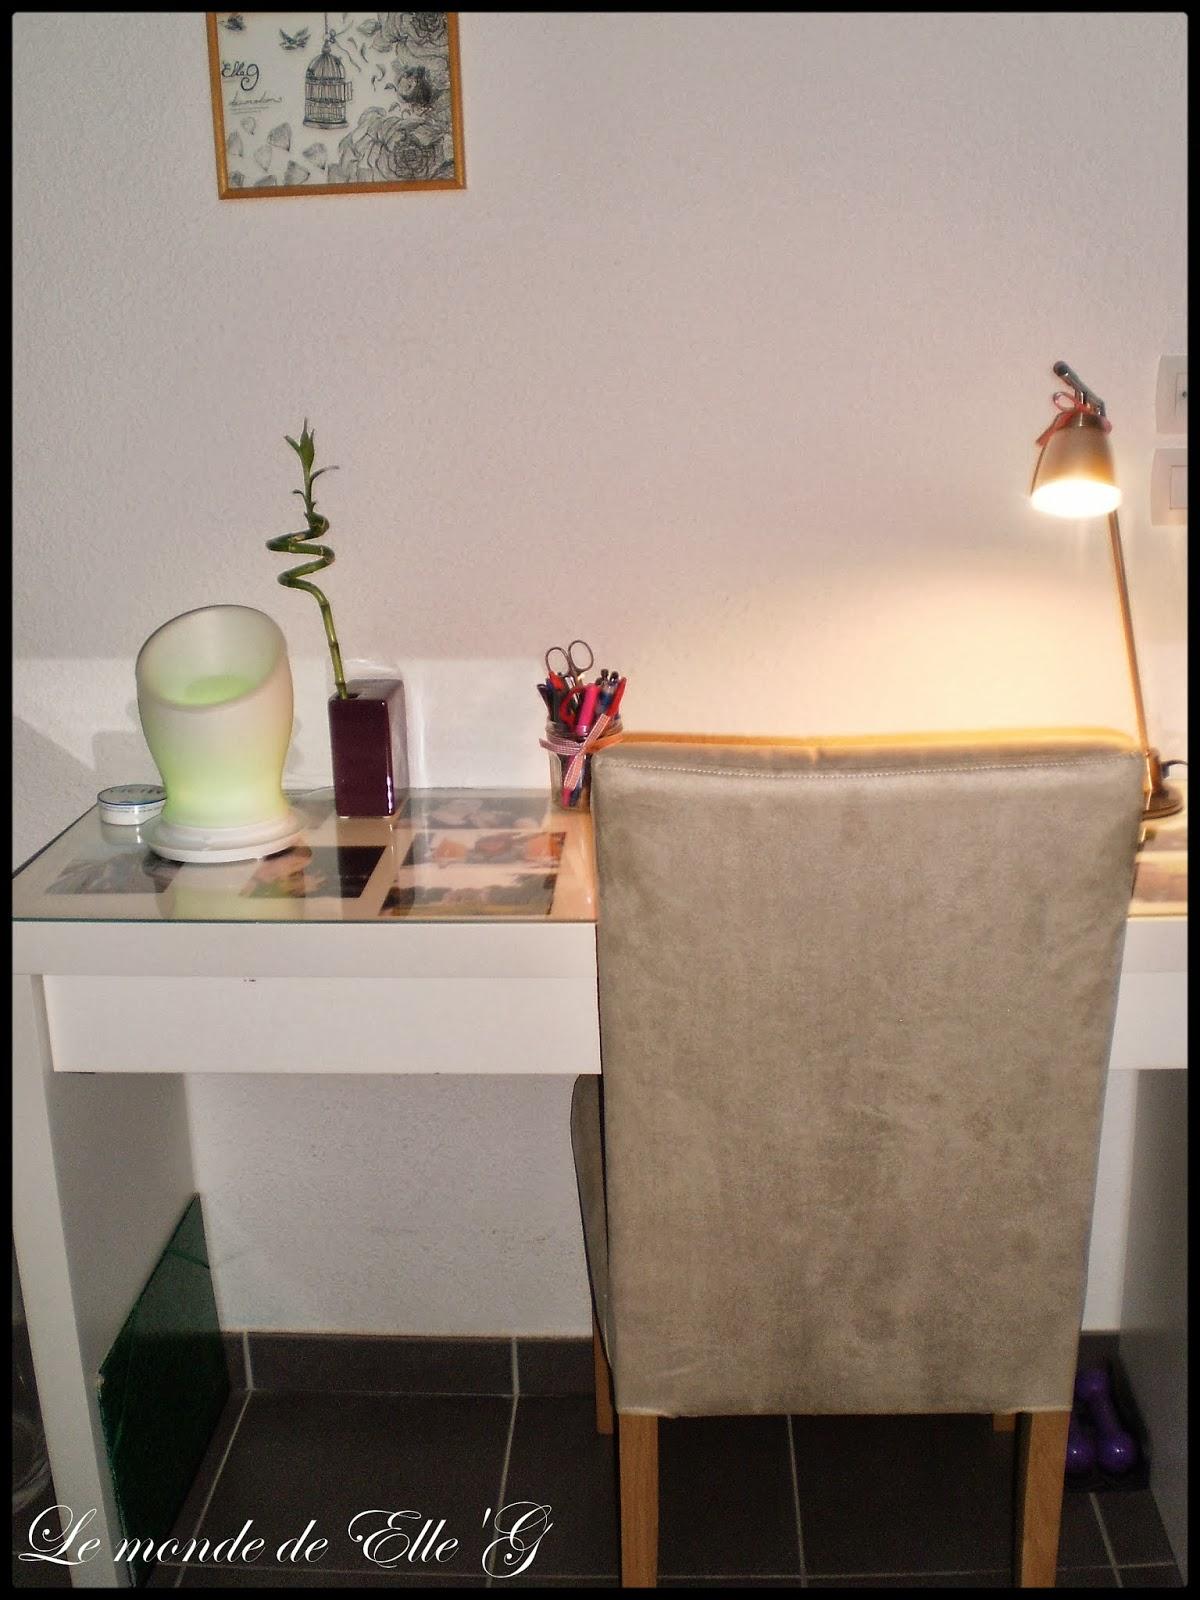 septembre 2013 le monde de elle 39 g. Black Bedroom Furniture Sets. Home Design Ideas